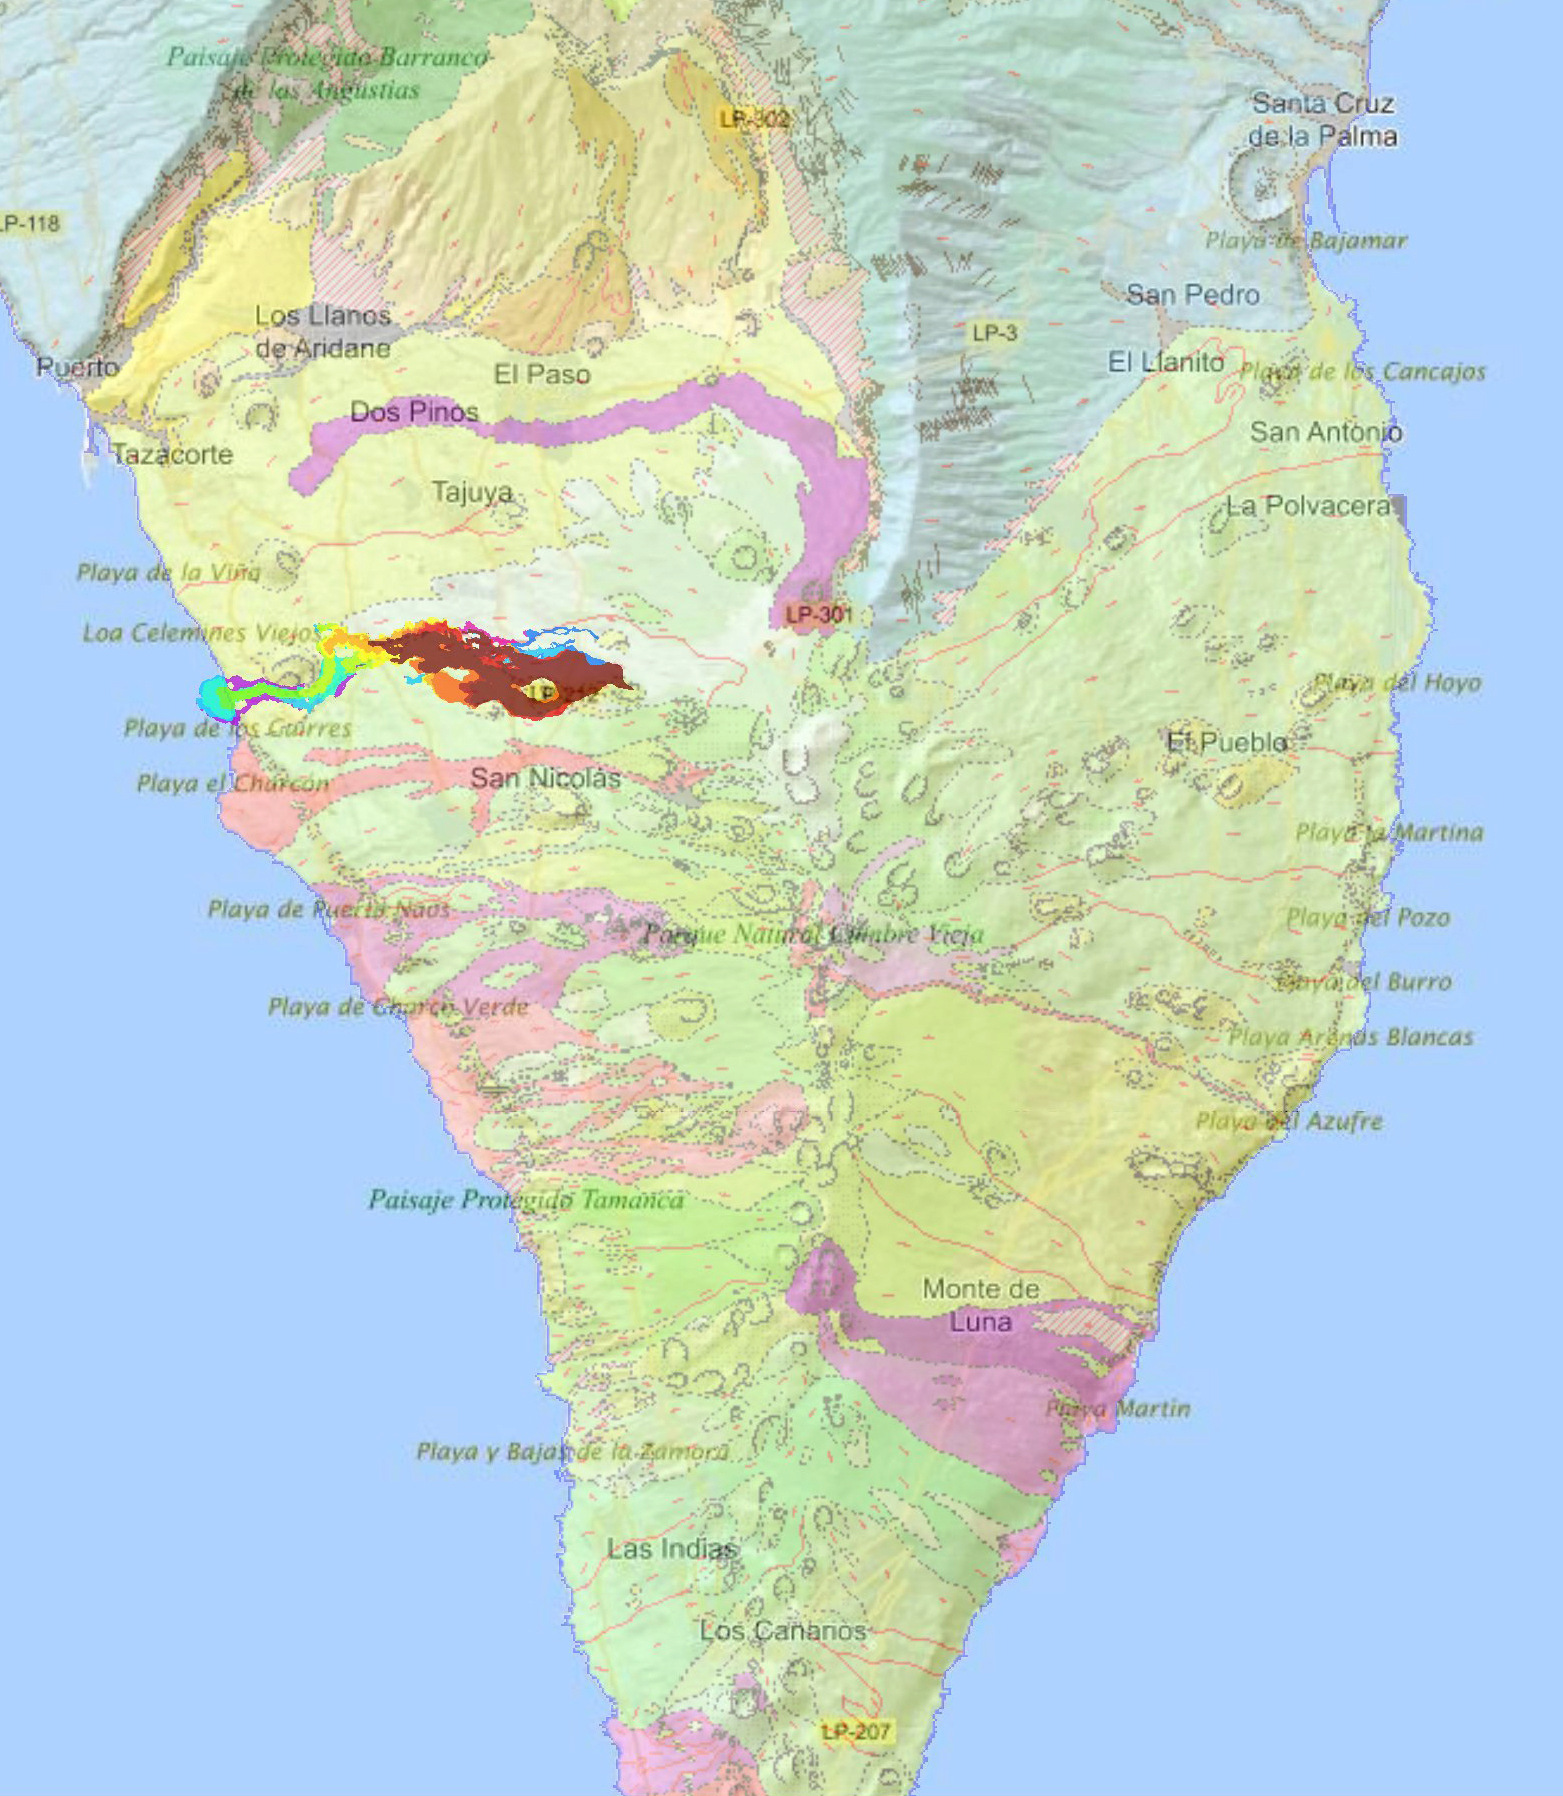 Eruption du volcan Cumbre Vieja - Ile de Palma - Canaries 20211011